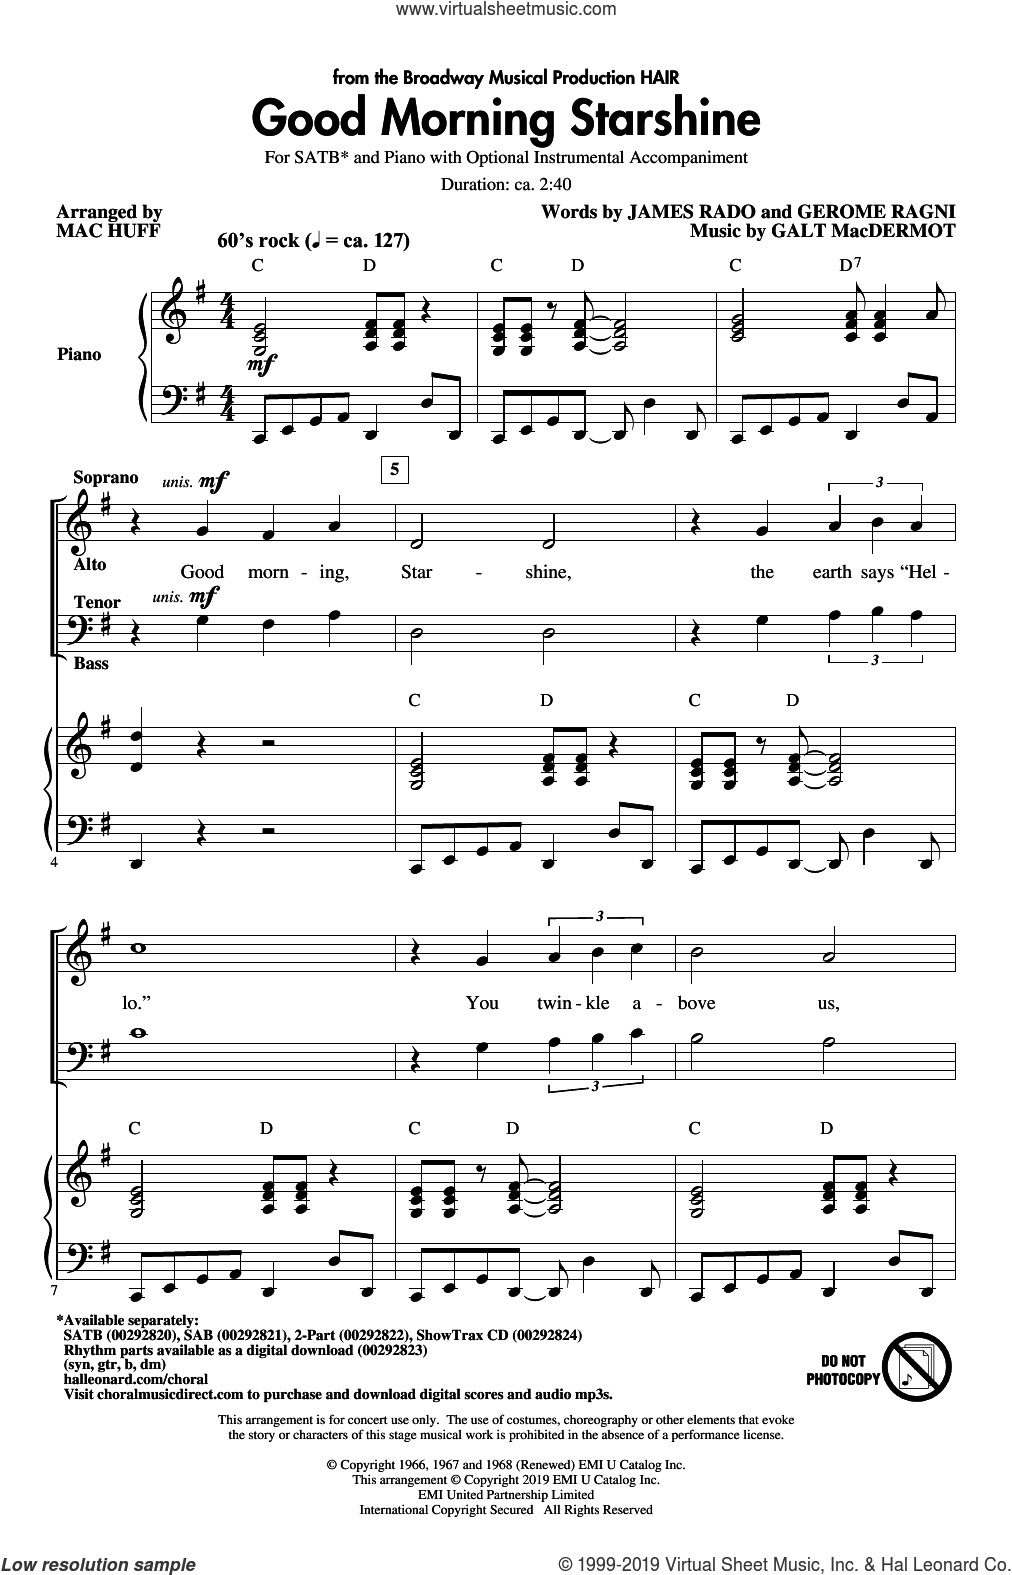 Good Morning Starshine (from the musical Hair) (arr. Mac Huff) sheet music for choir (SATB: soprano, alto, tenor, bass) by Galt MacDermot, Mac Huff, Gerome Ragni and James Rado, intermediate skill level